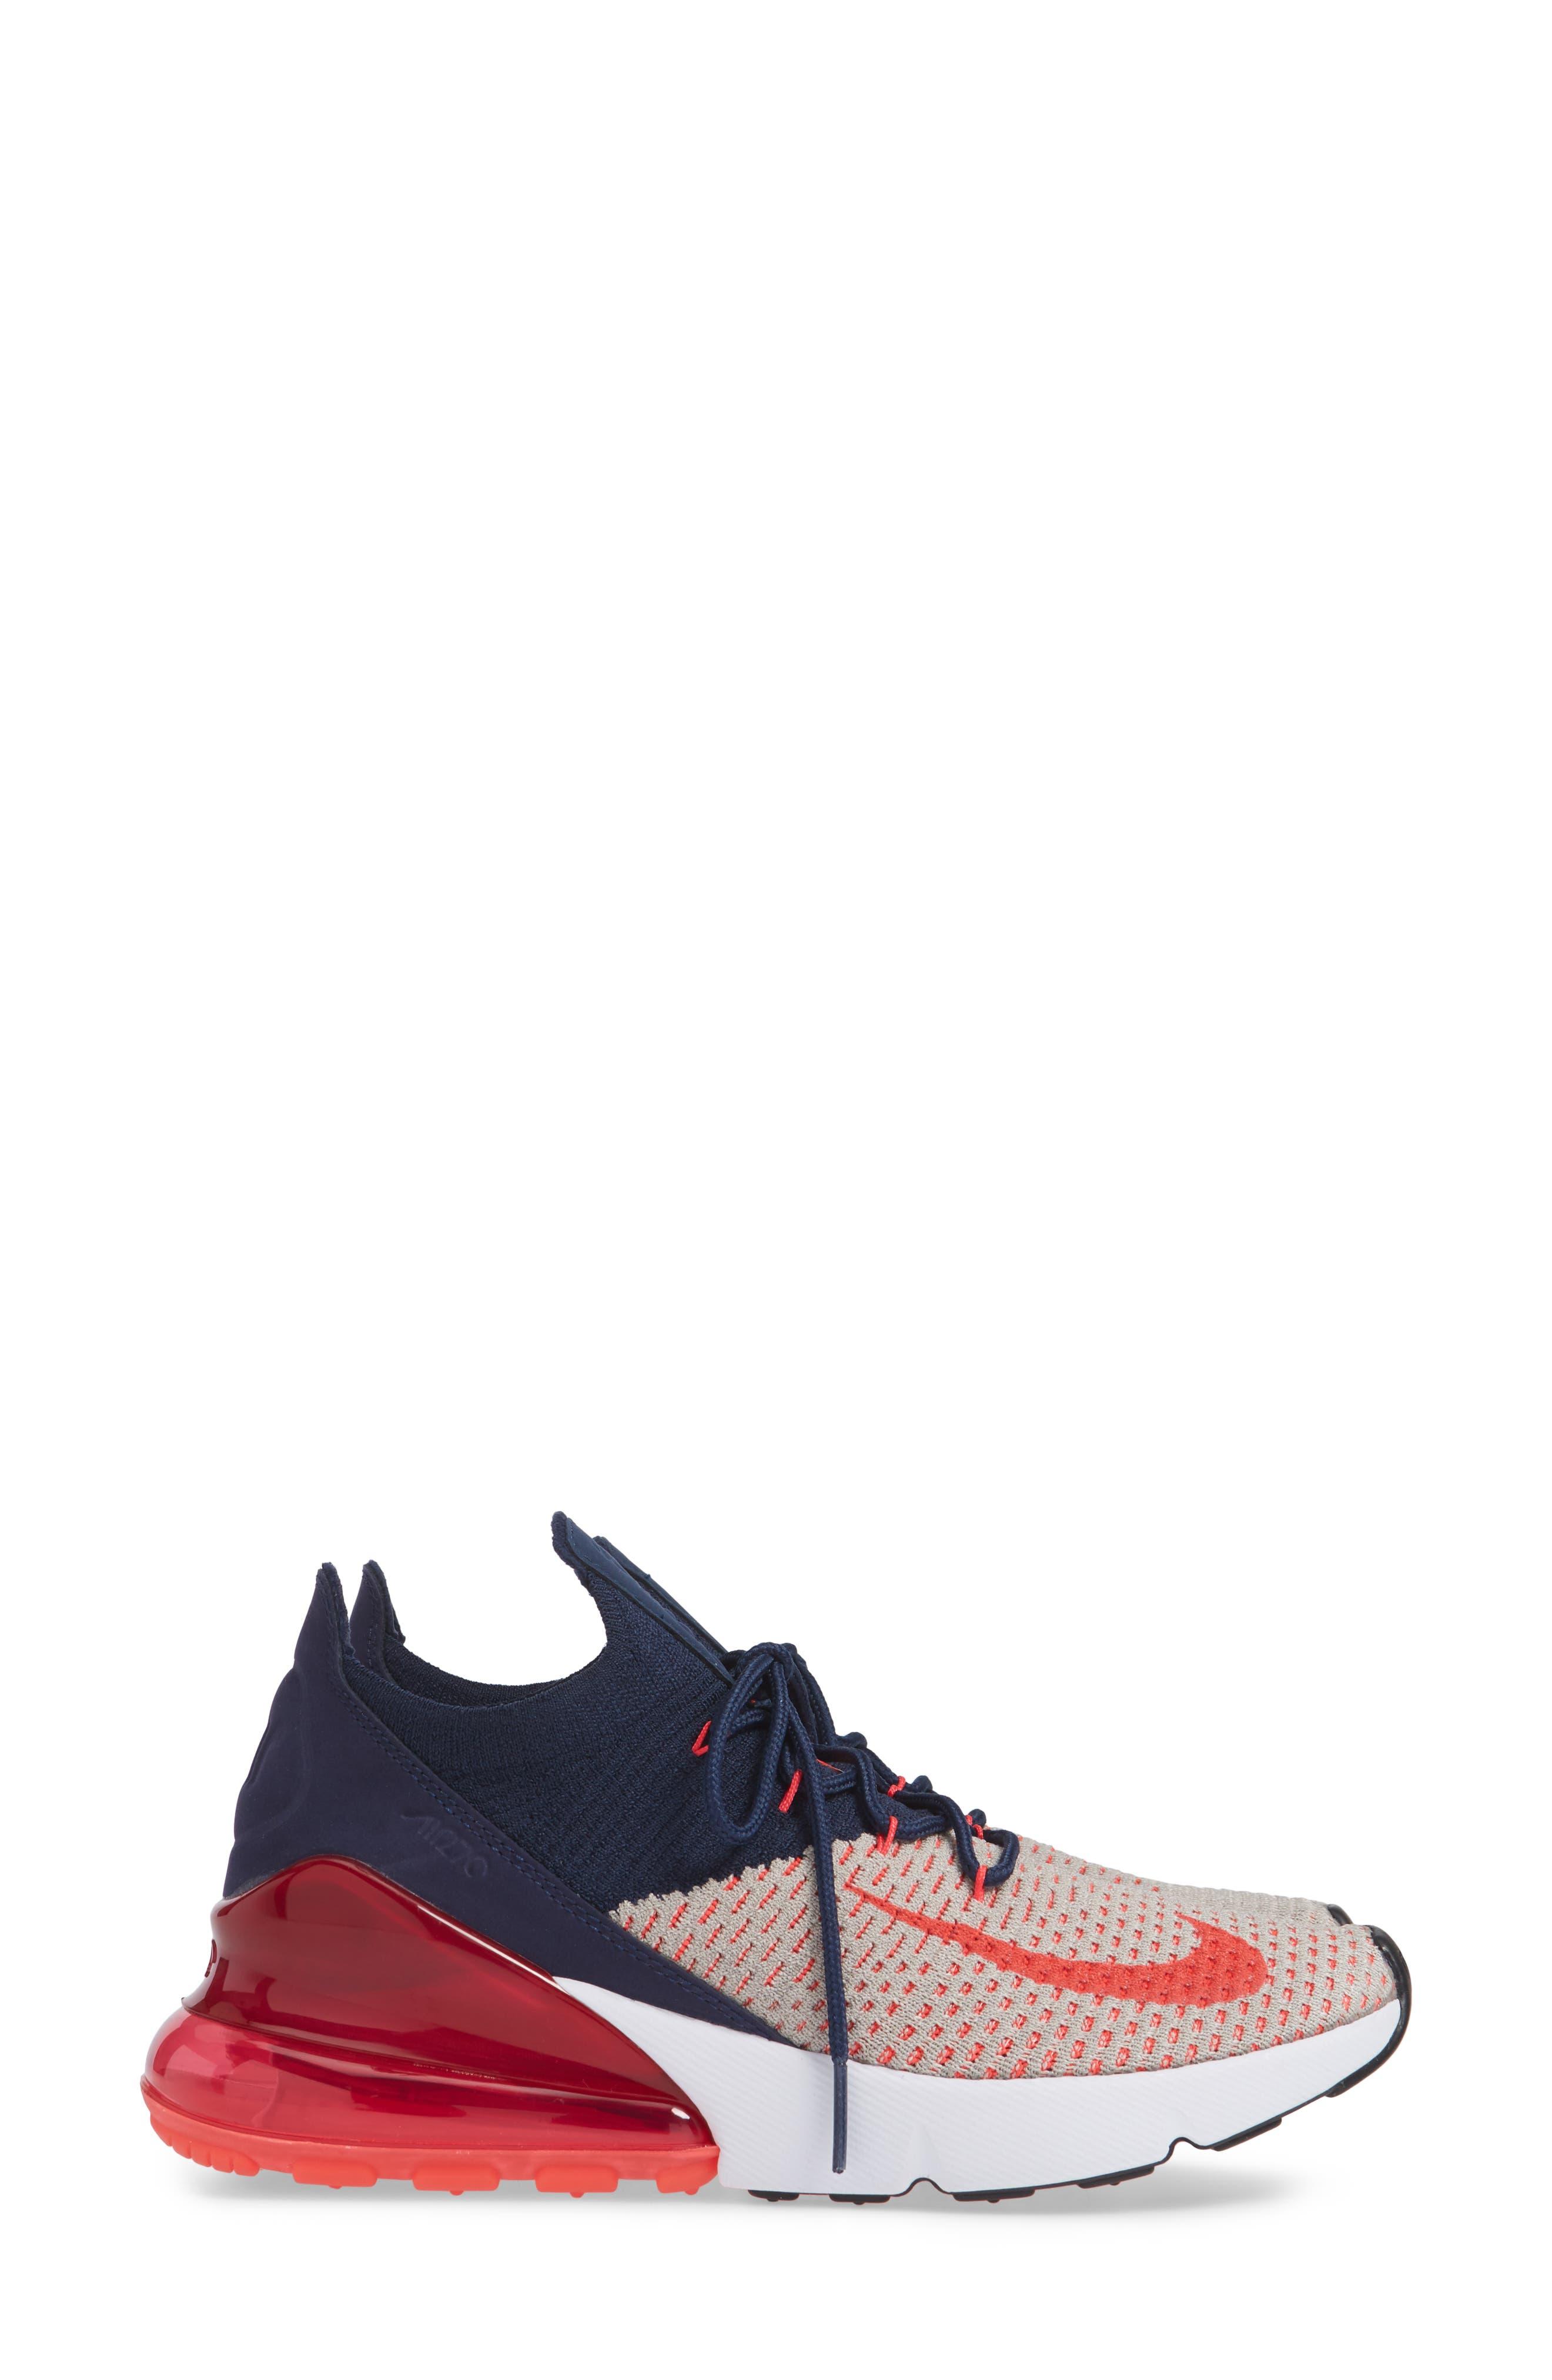 Air Max 270 Flyknit Sneaker,                             Alternate thumbnail 25, color,